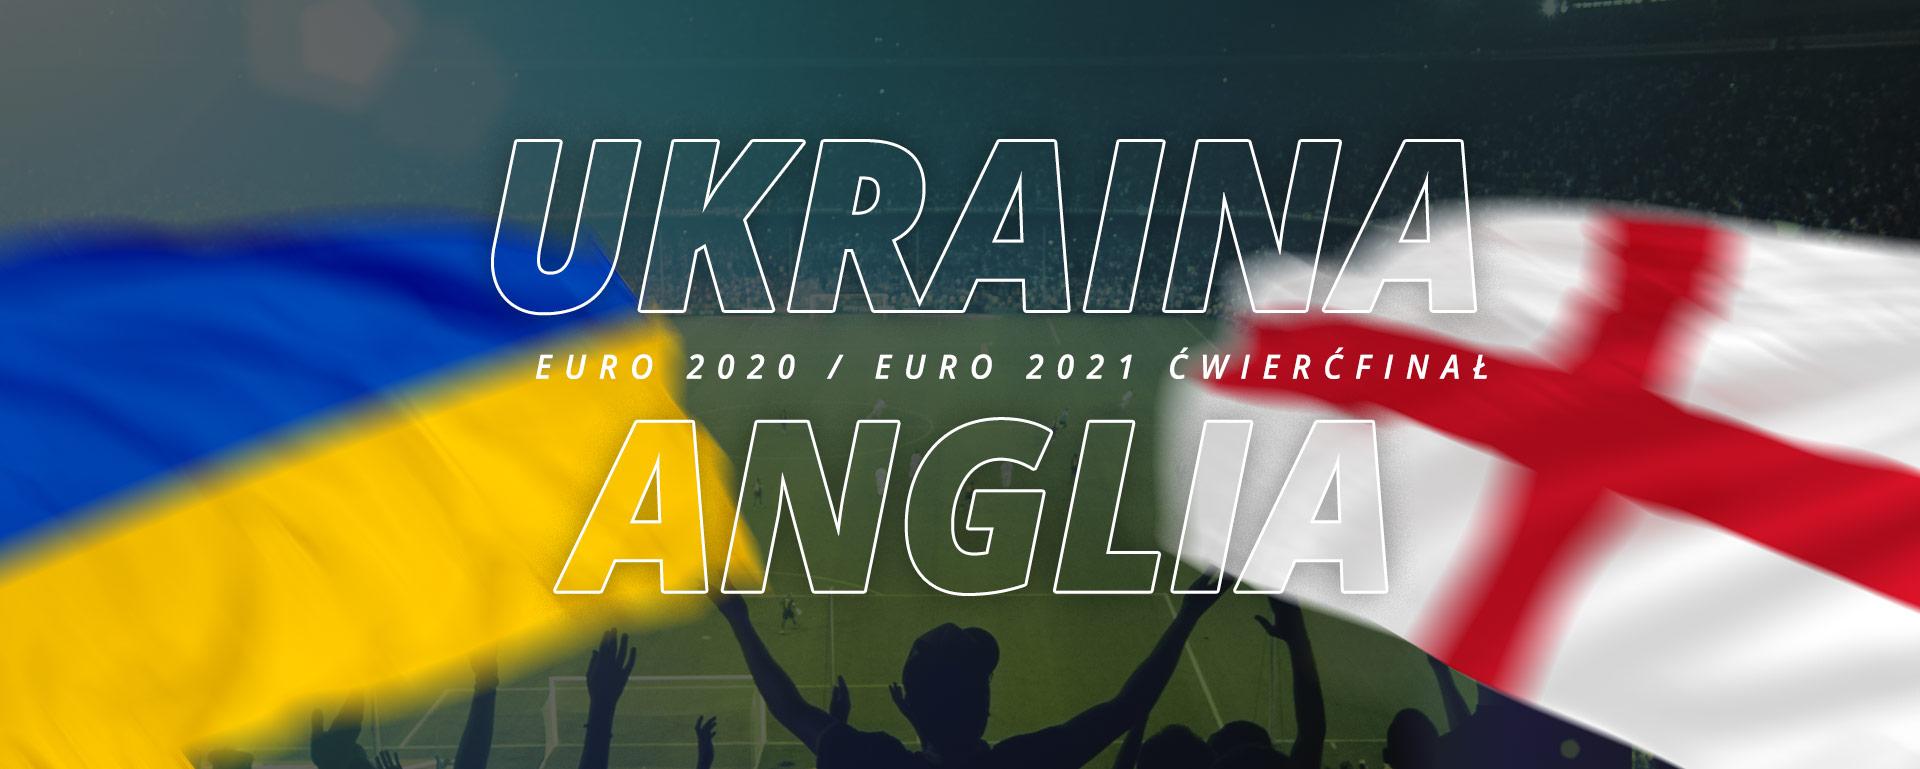 Ukraina – Anglia | ćwierćfinał Euro 2020 / Euro 2021